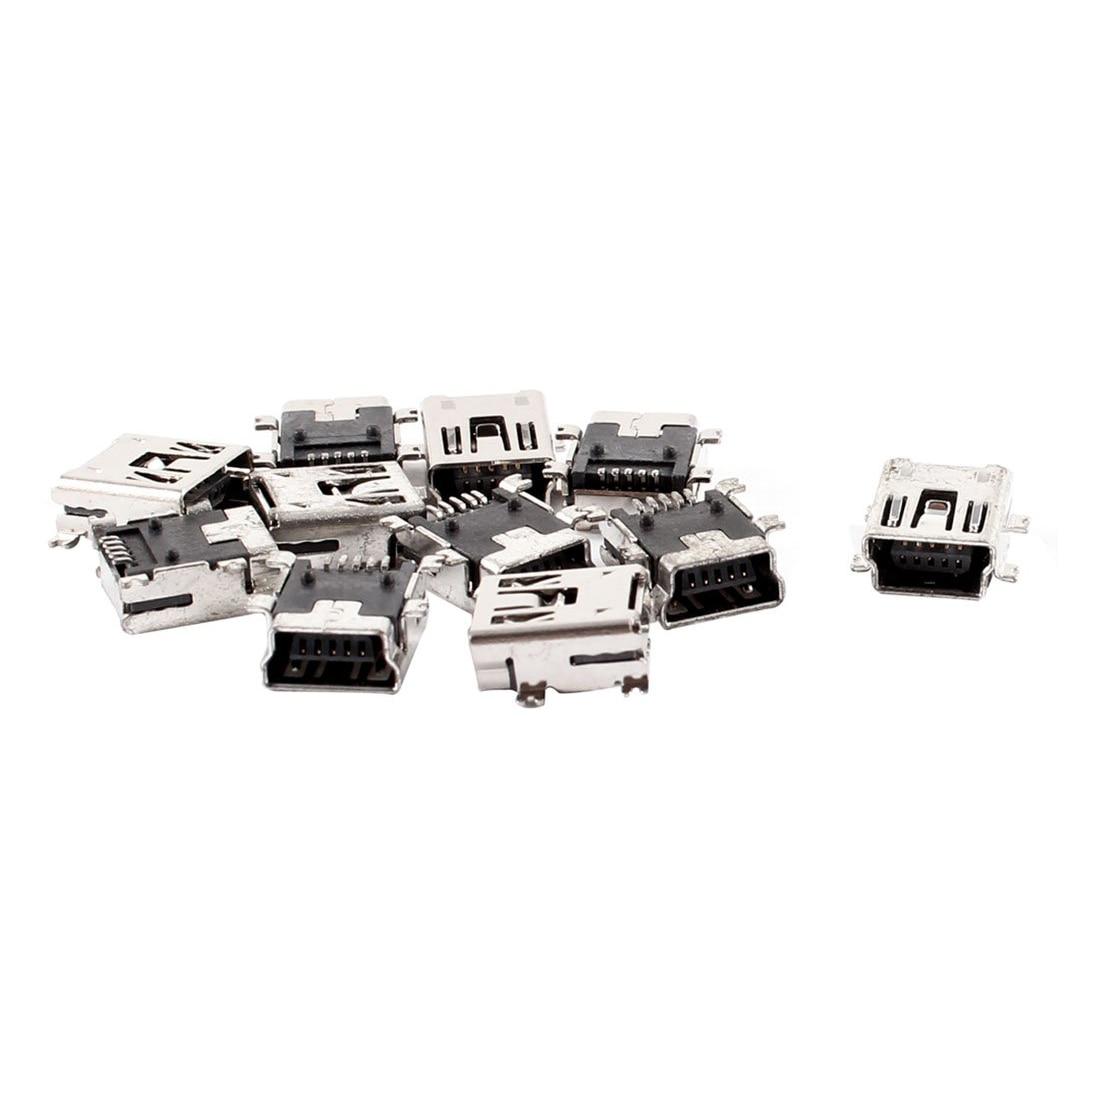 imc hot mini usb type b female 5 pin pcb board mount jack connector 10 pcs